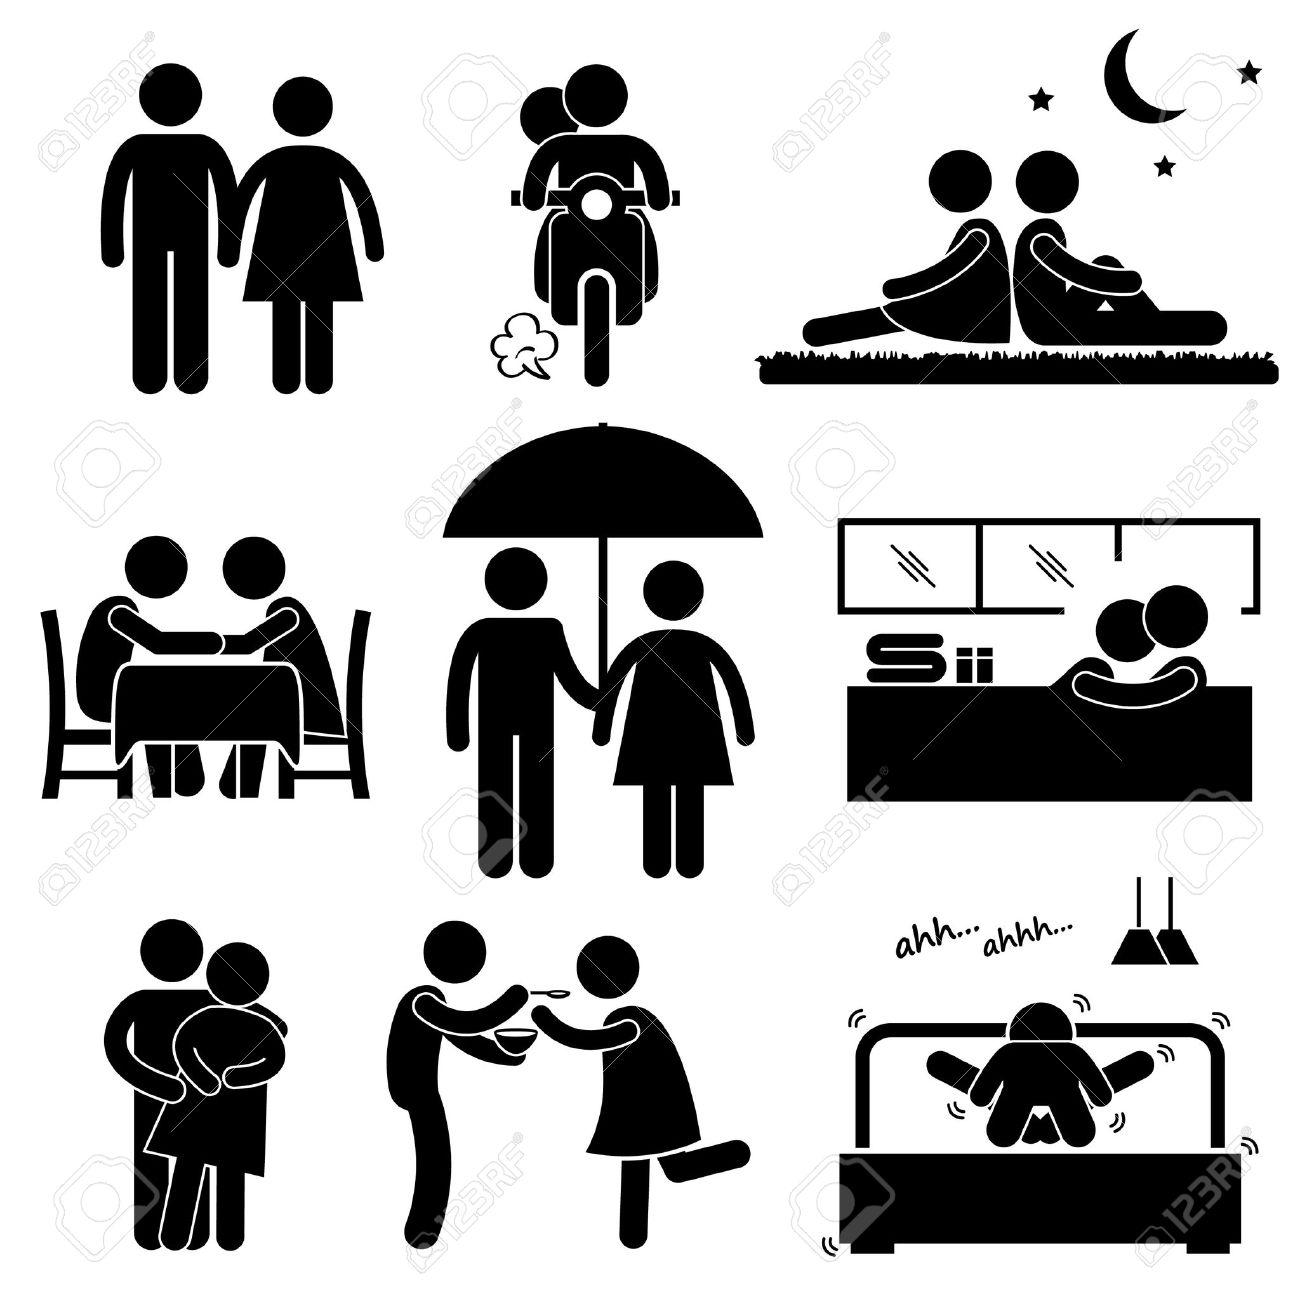 Lover Couple Boyfriend Girlfriend Sweetheart Relationship Activity Stick Figure Pictogram Icon Stock Vector - 19686422